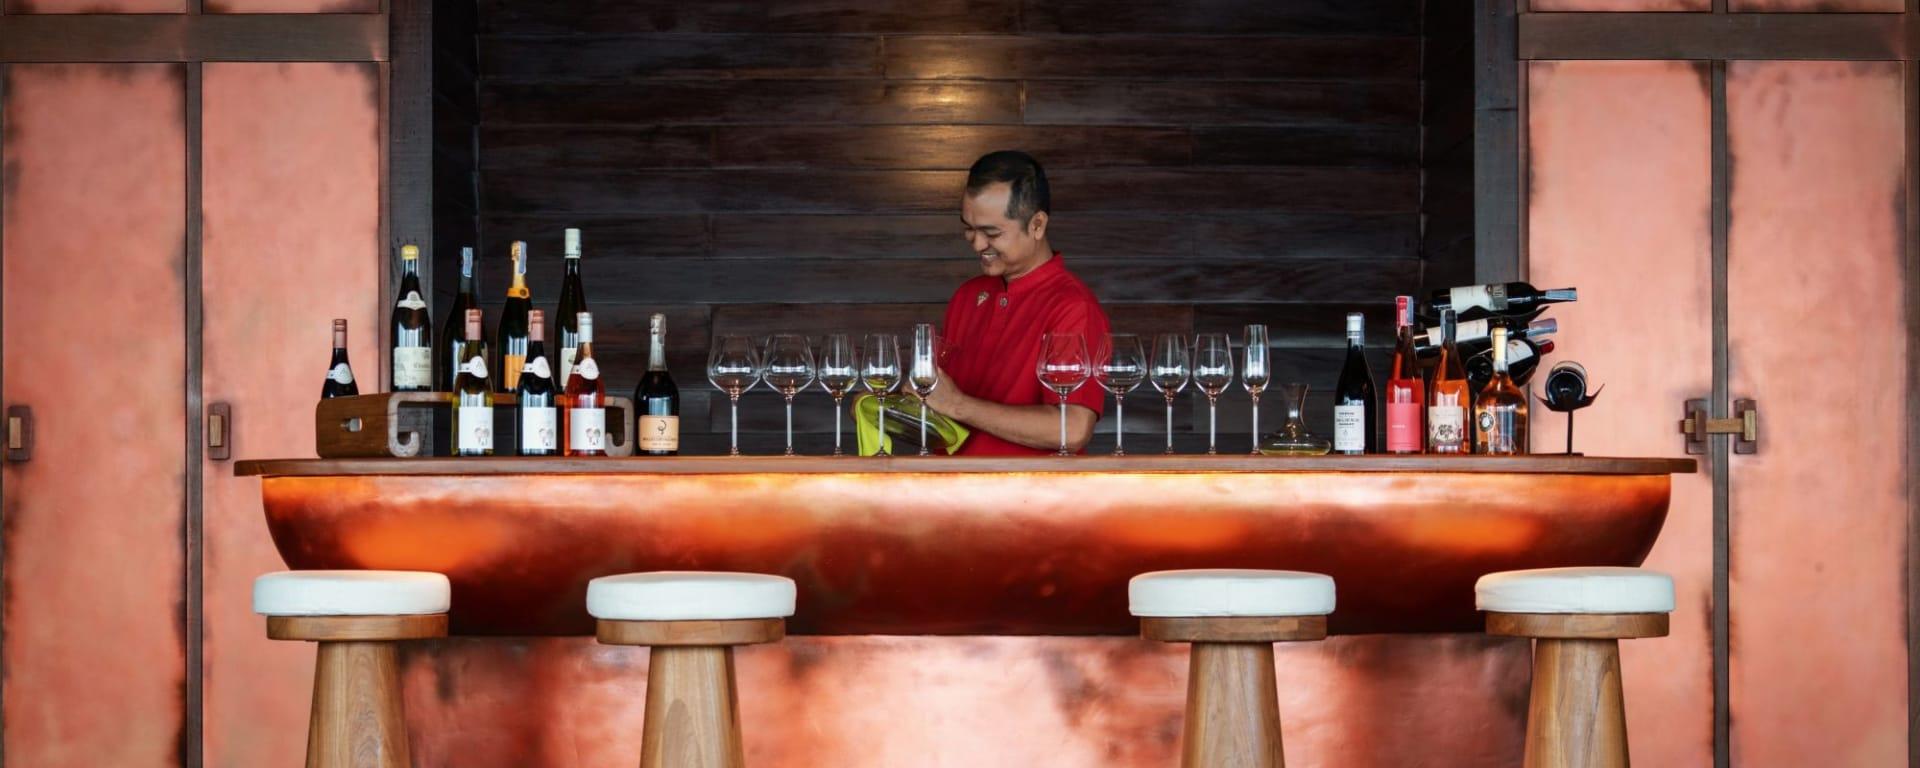 Six Senses Yao Noi in Ko Yao: Tasting Room at The Hilltop